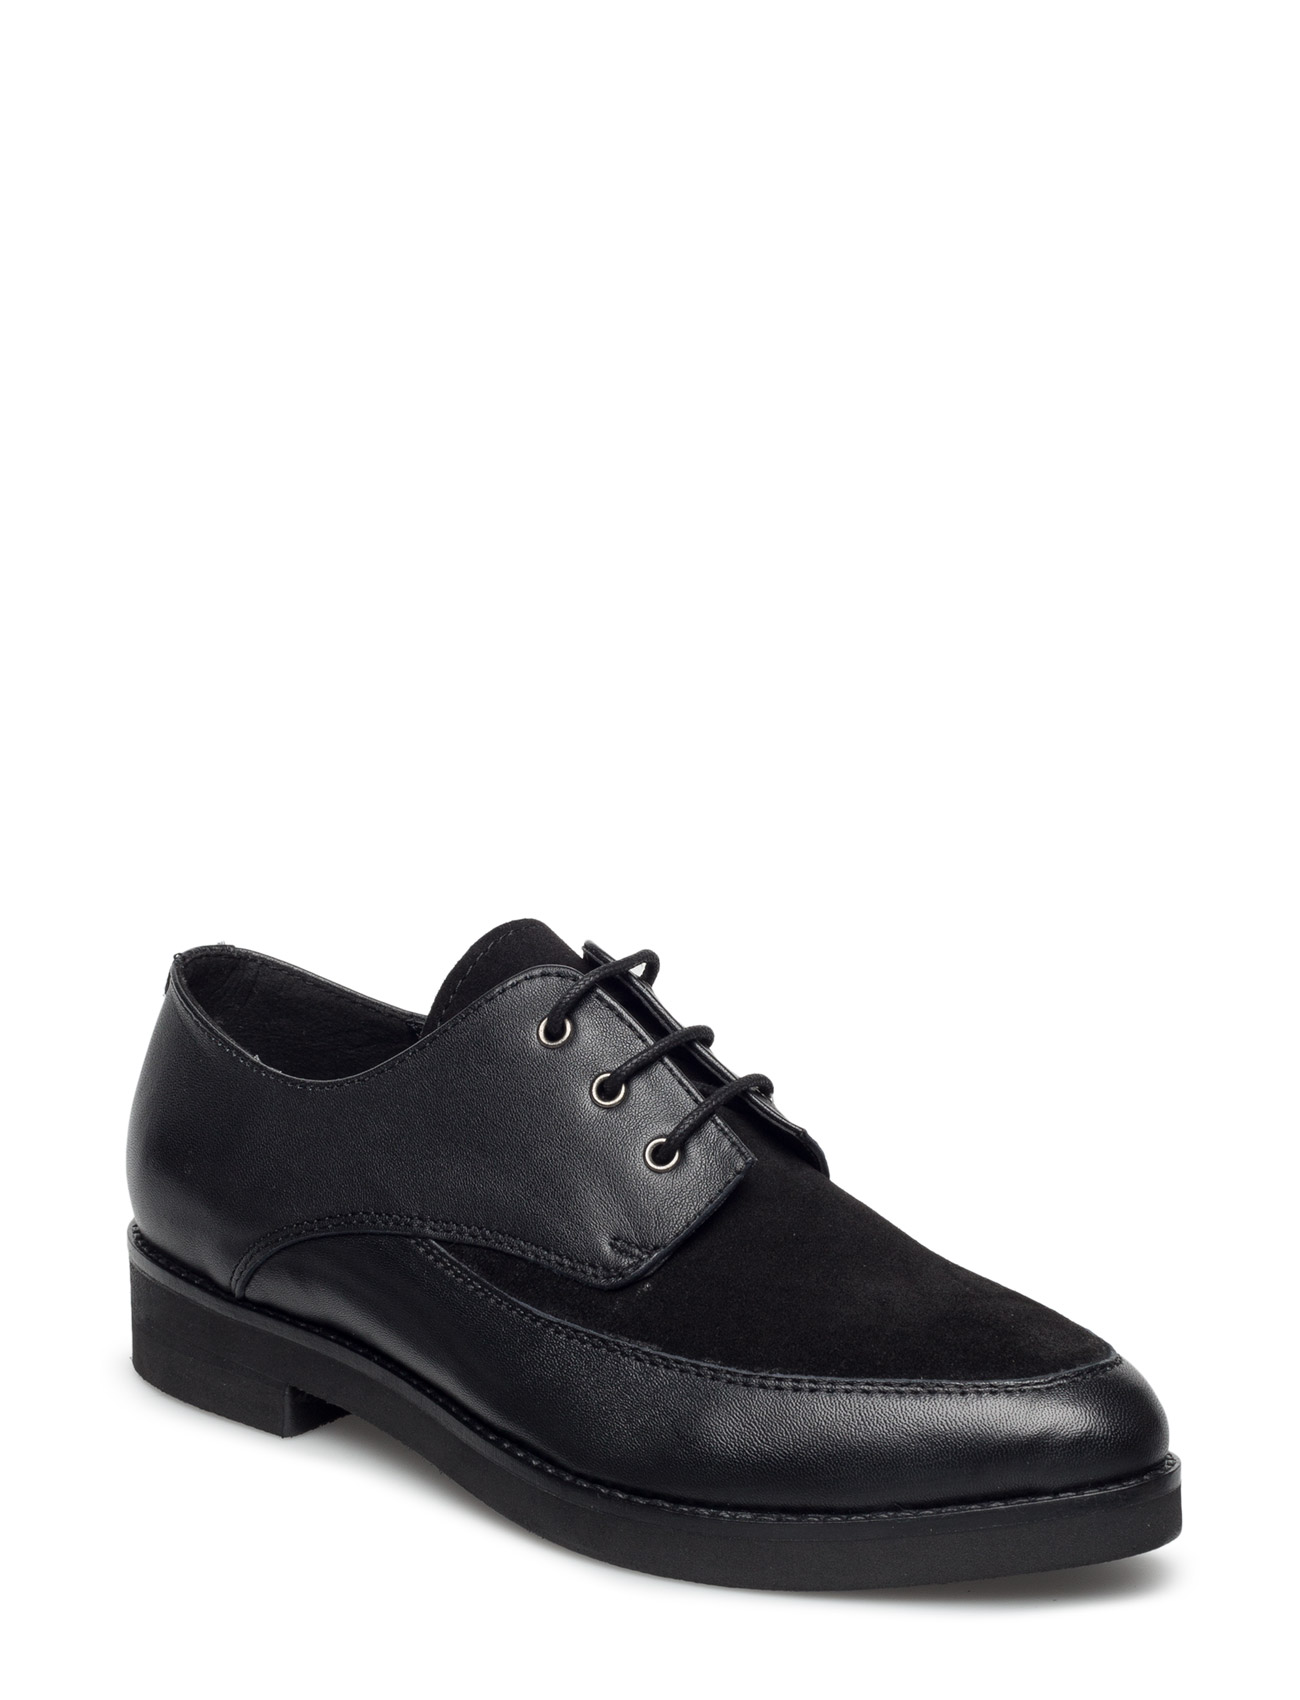 Classic Shoe With Laces UNMADE Copenhagen Flade sko til Damer i Sort